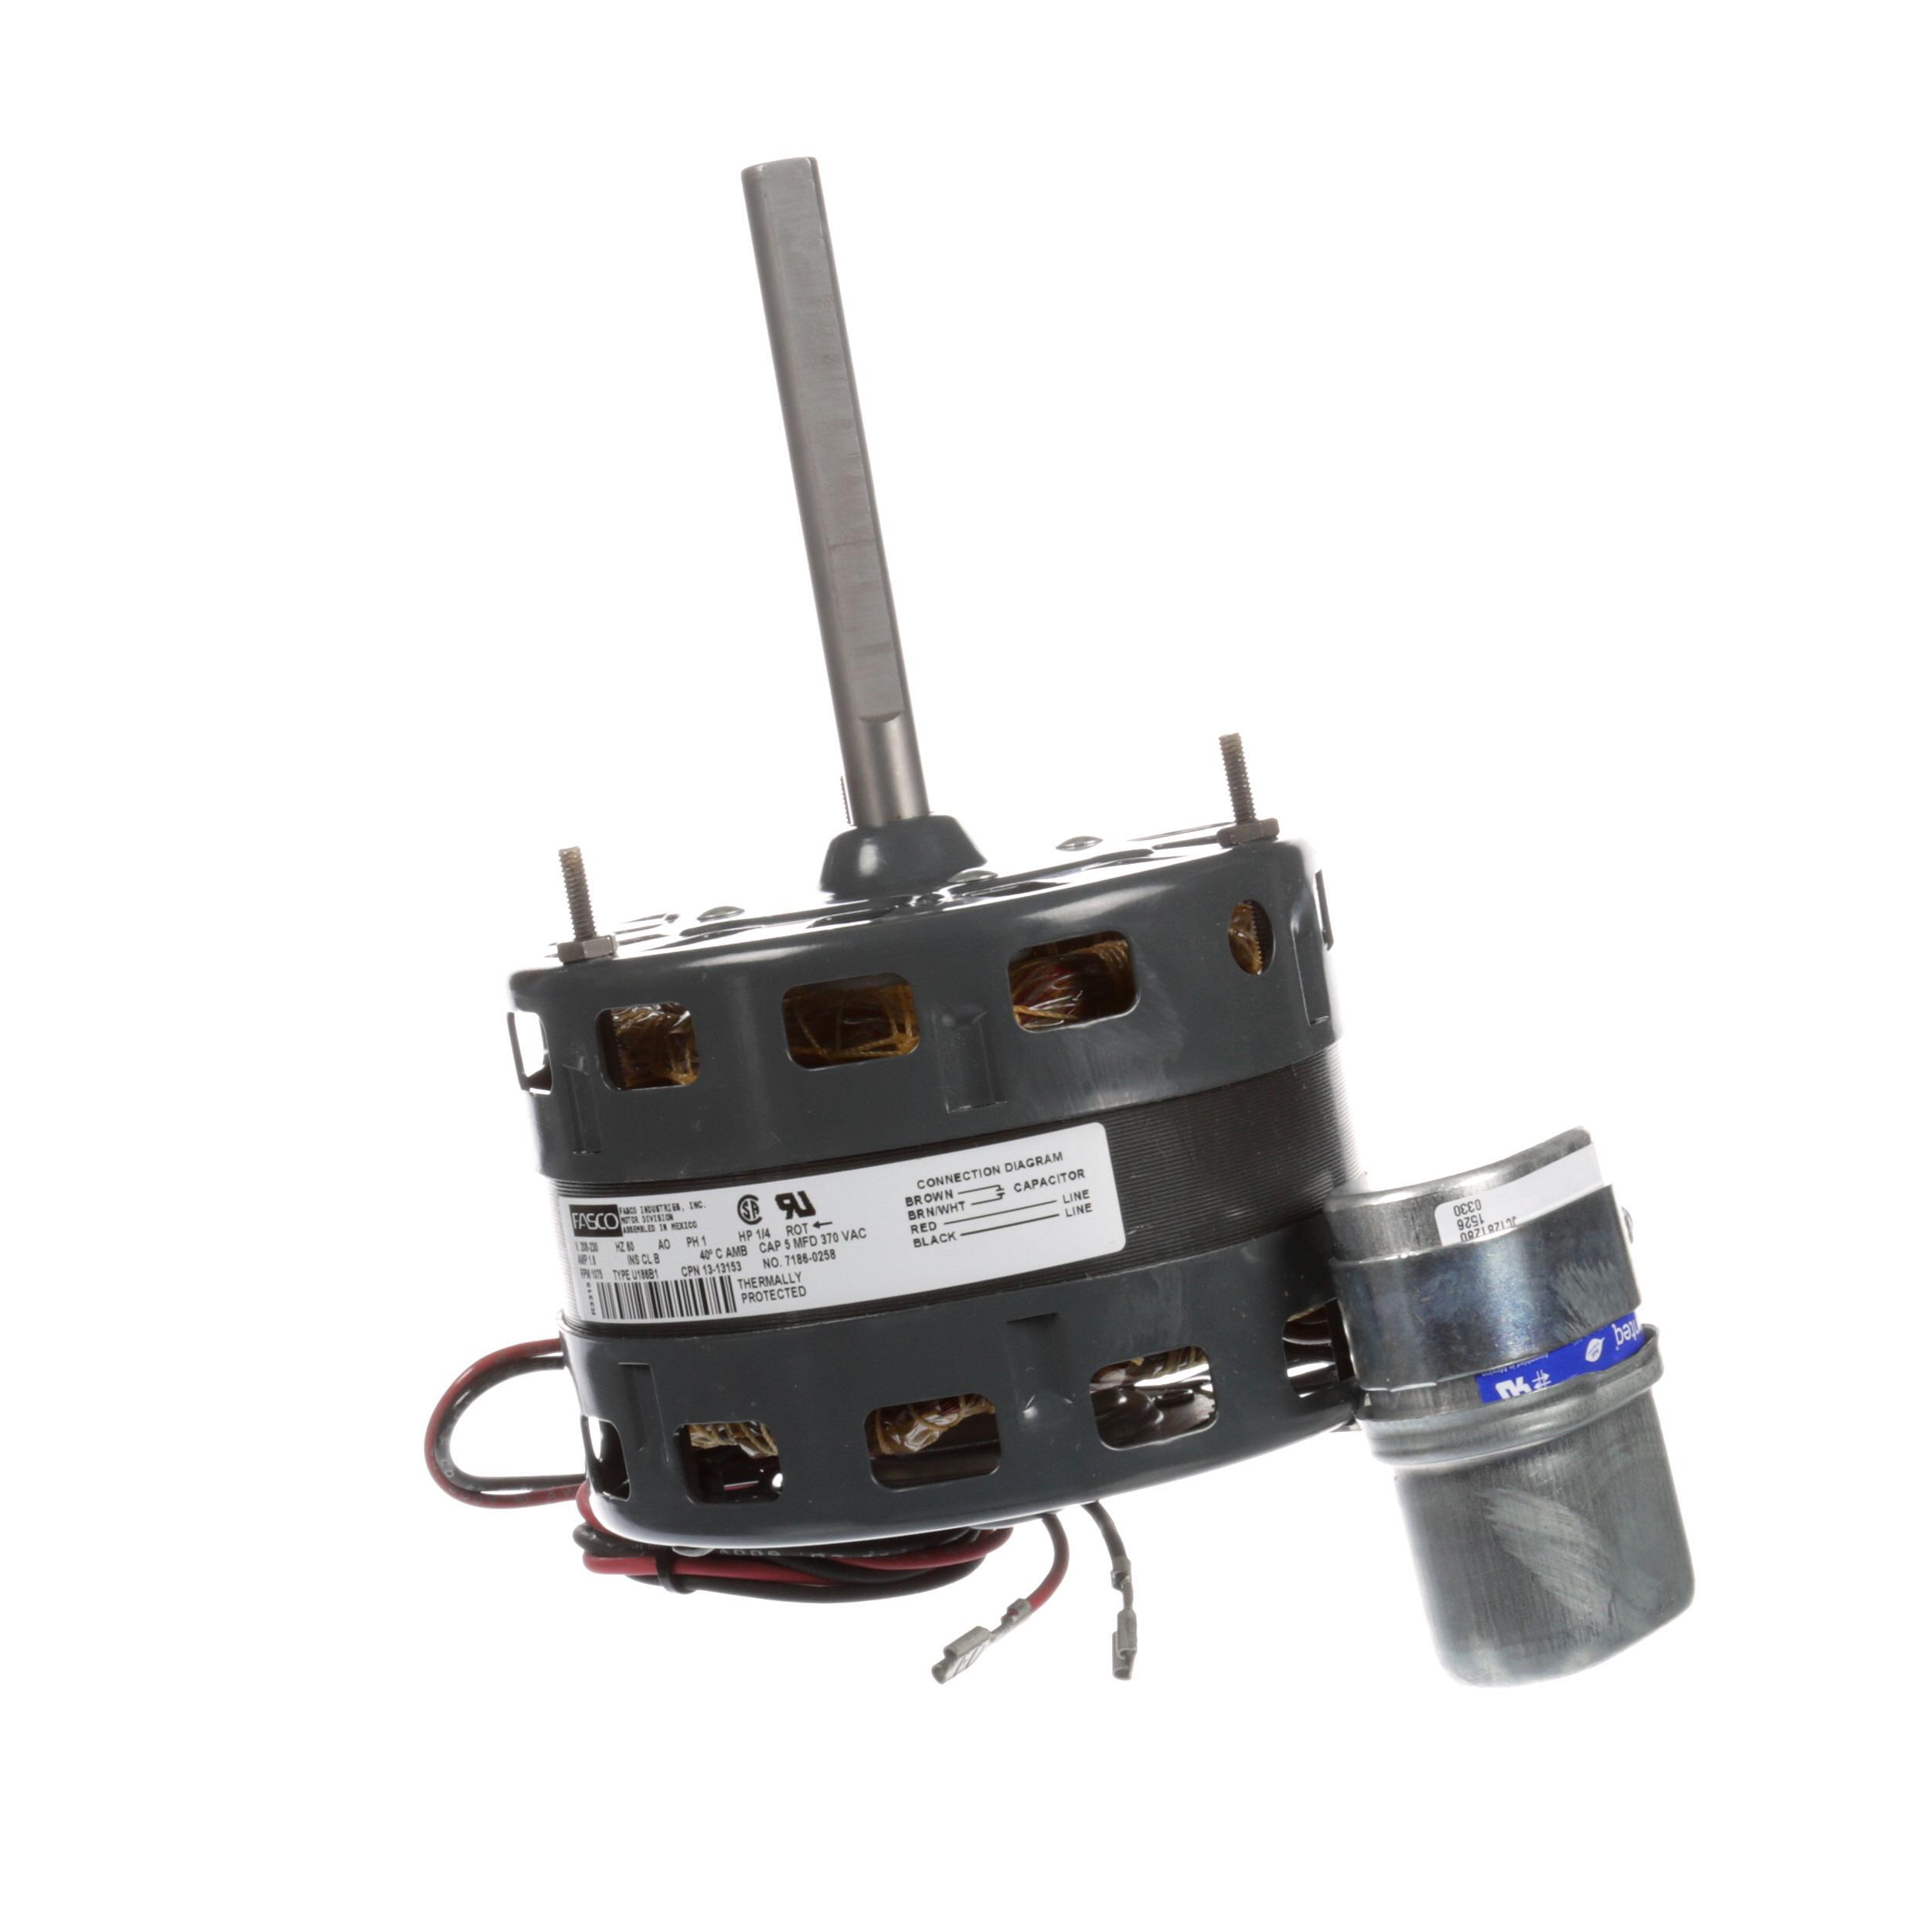 Master bilt condenser fan motor 7186 025 part 13 13153 for Capacitor for fan motor